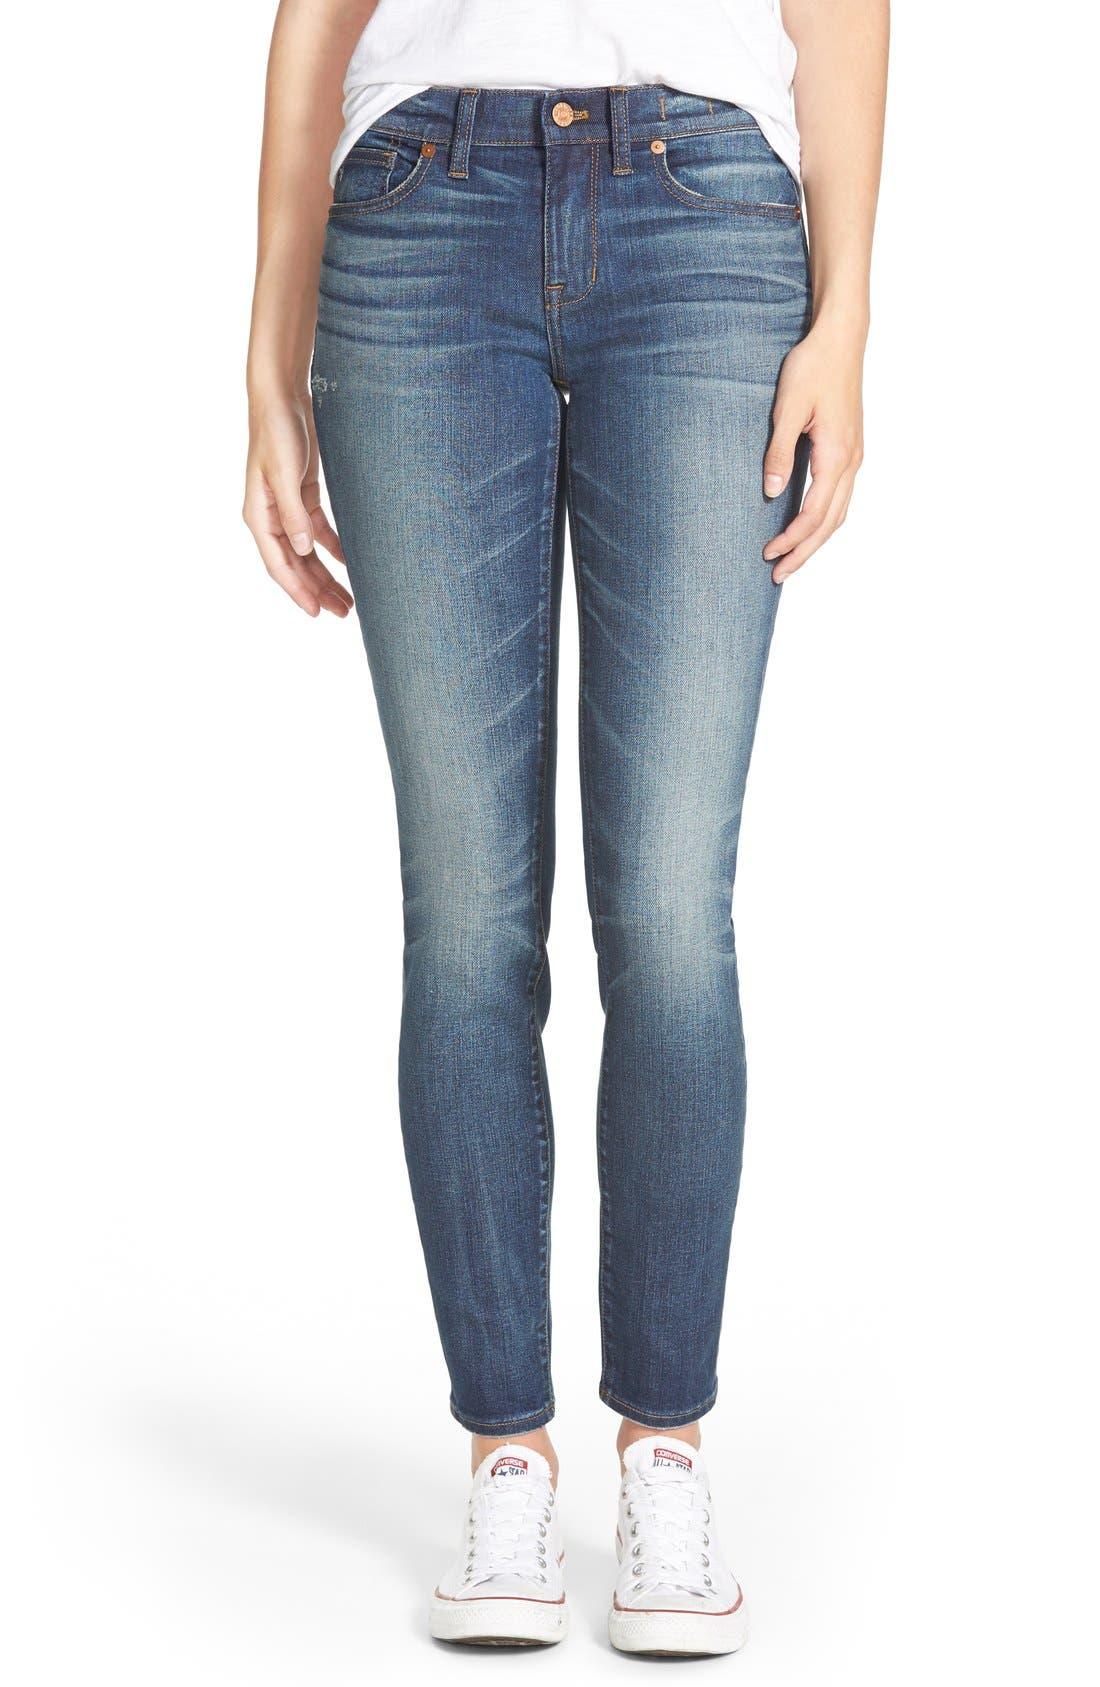 Main Image - Madewell 'Skinny Skinny - Taller' Jeans (Edmonton Wash) (Long)